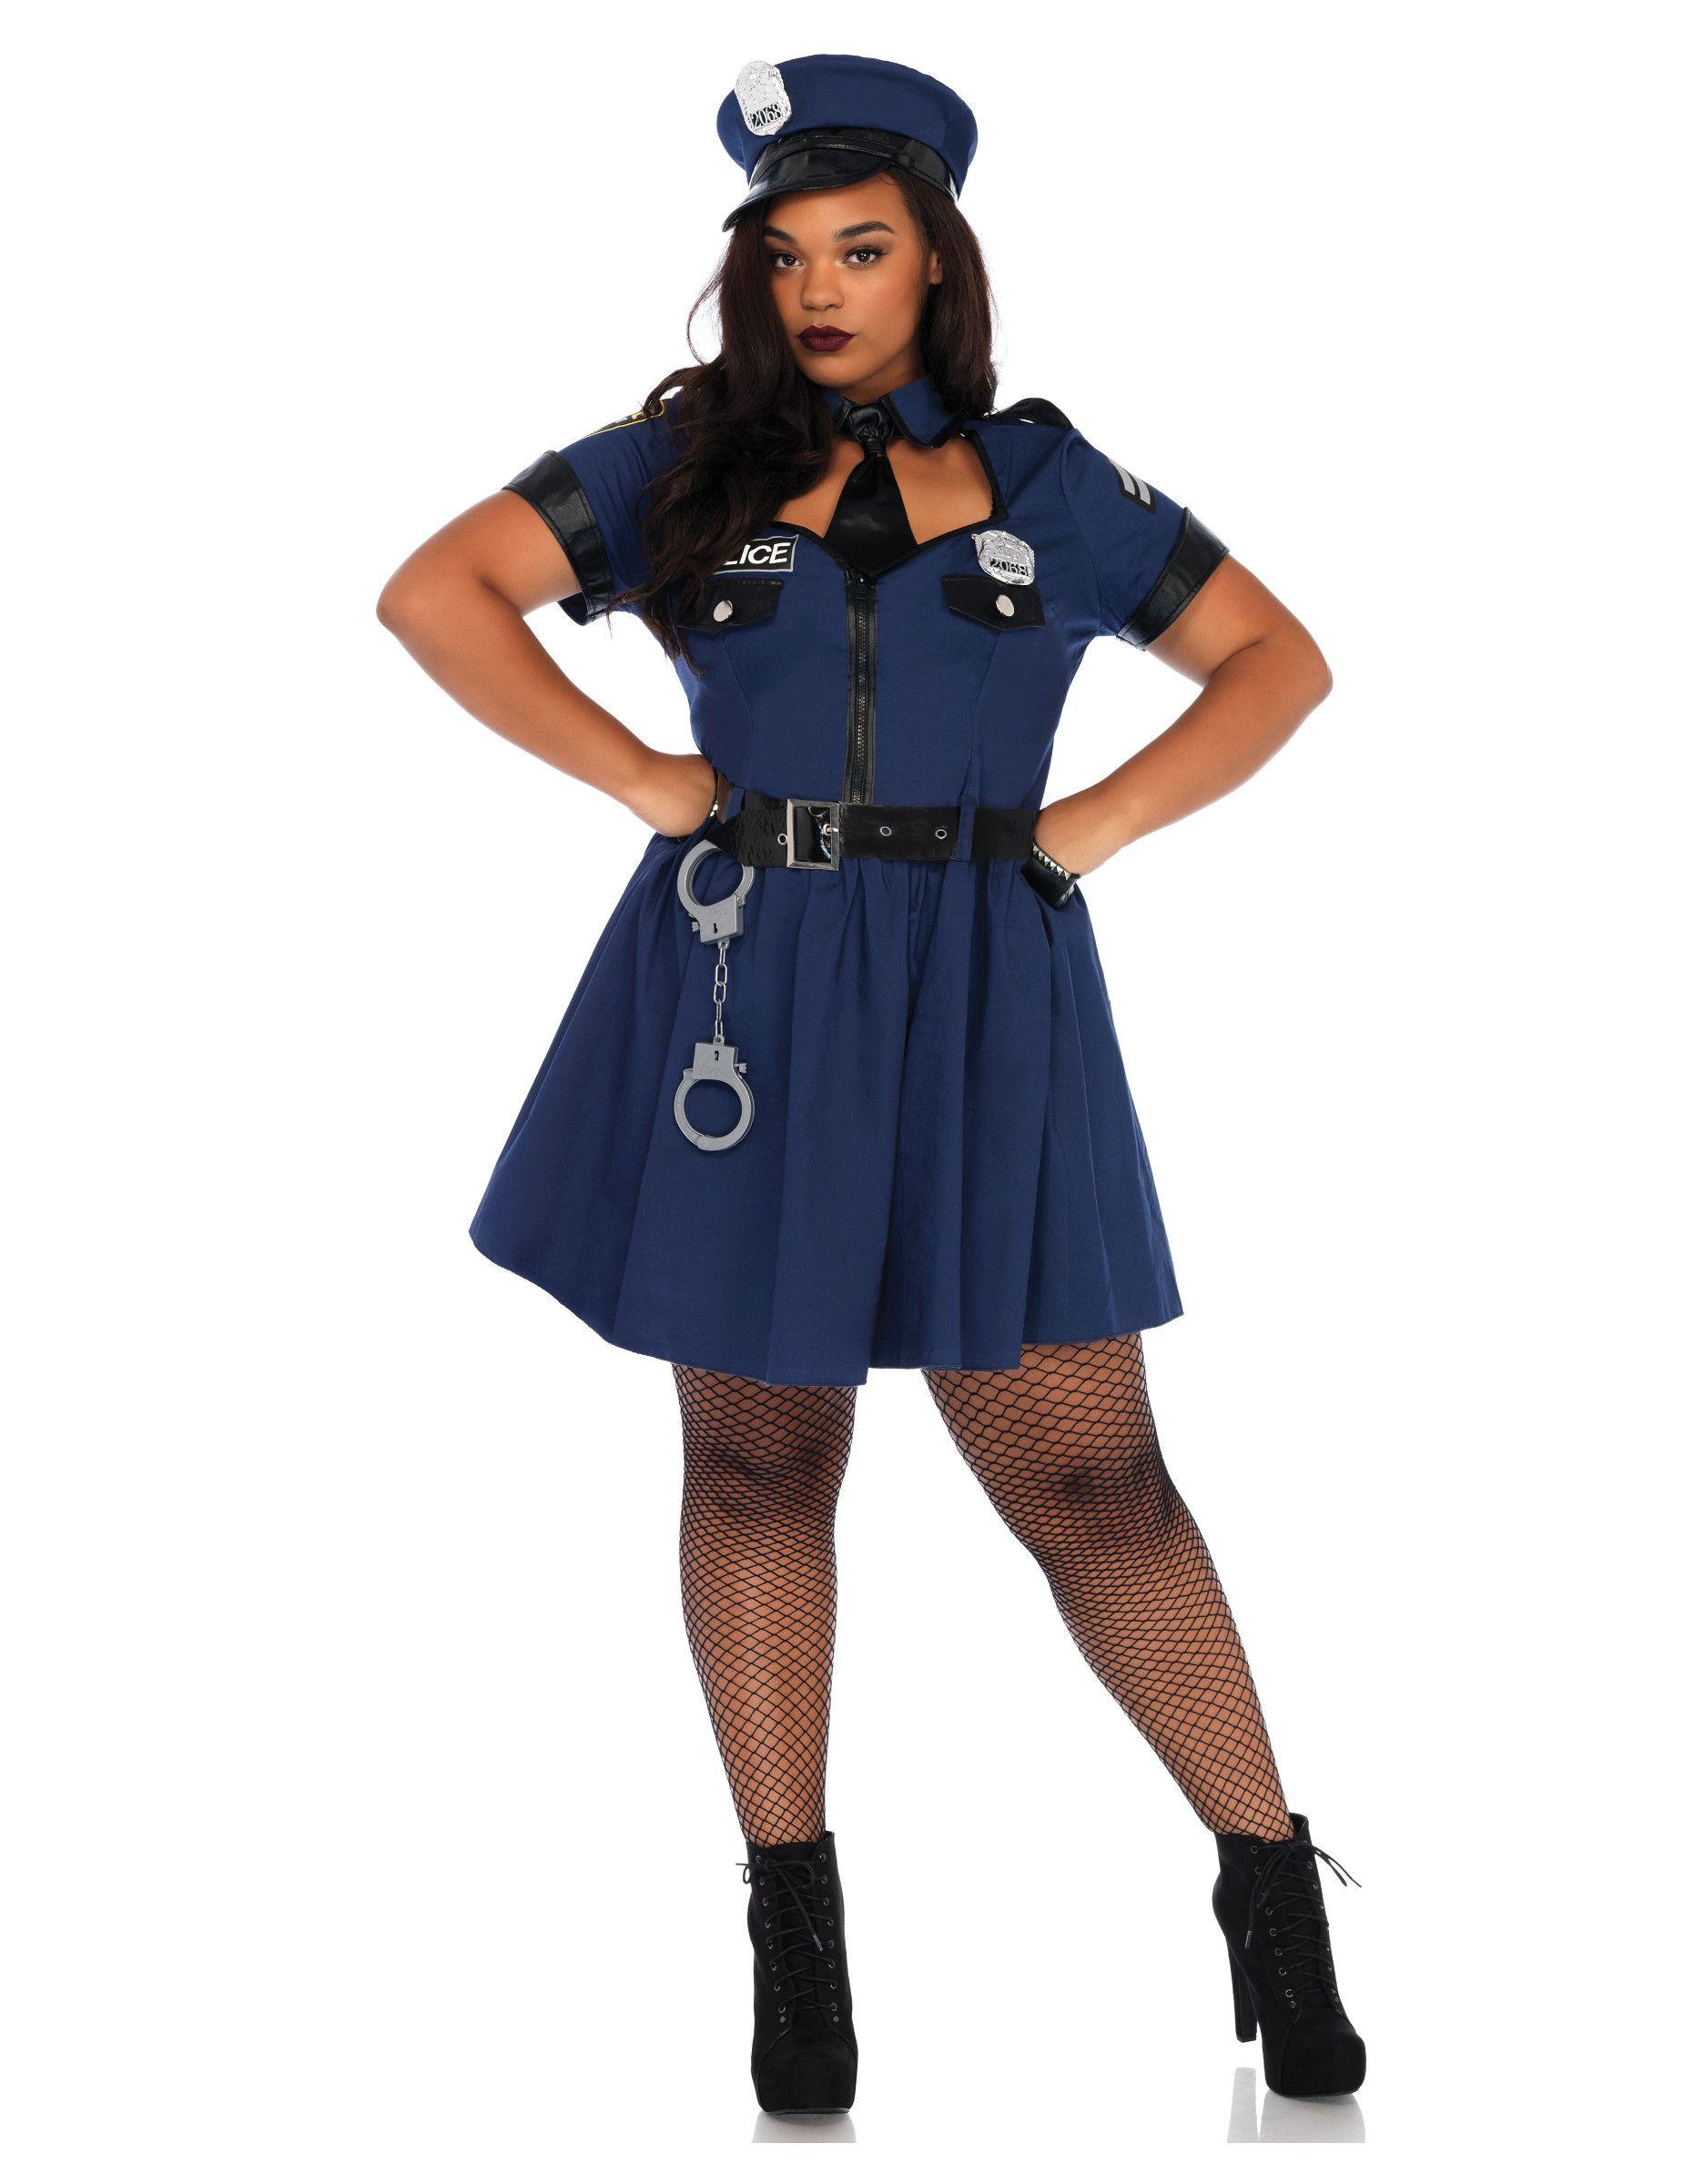 Heisse Polizistin Damenkostum In Ubergrosse Blau Pinterest